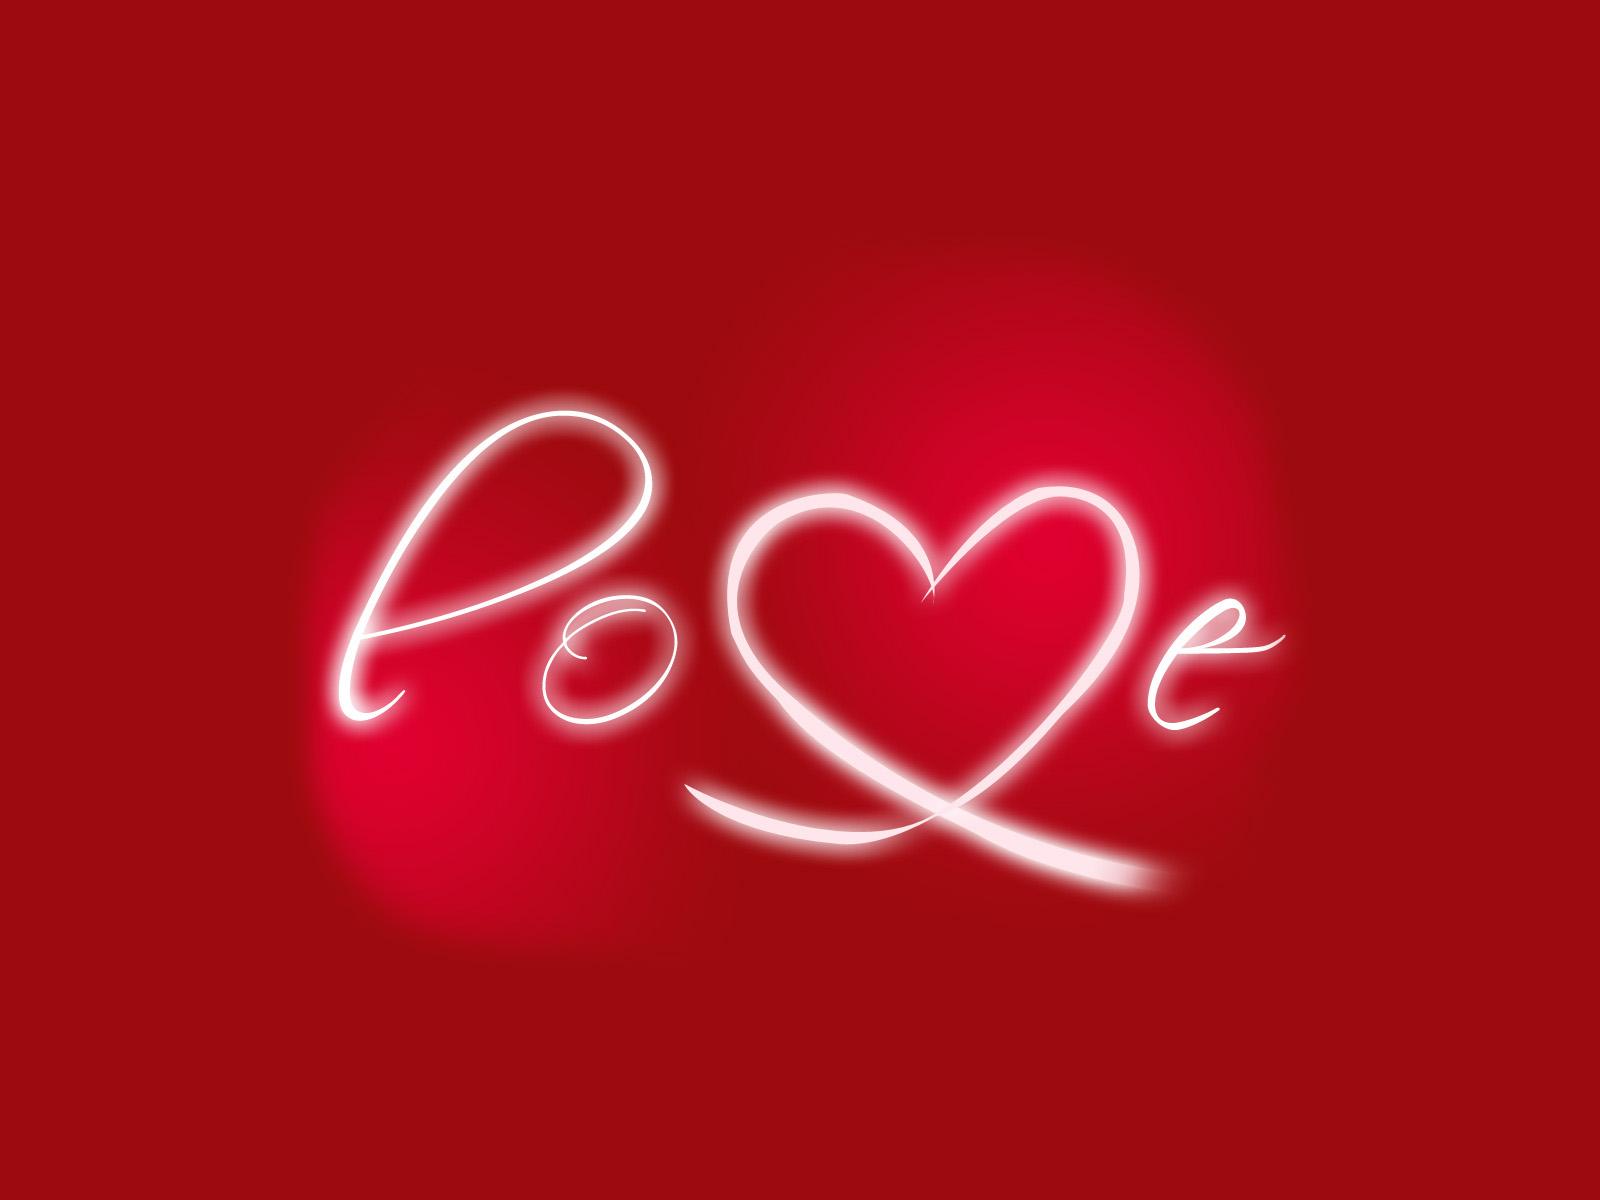 75 Love Logo Wallpapers On Wallpapersafari